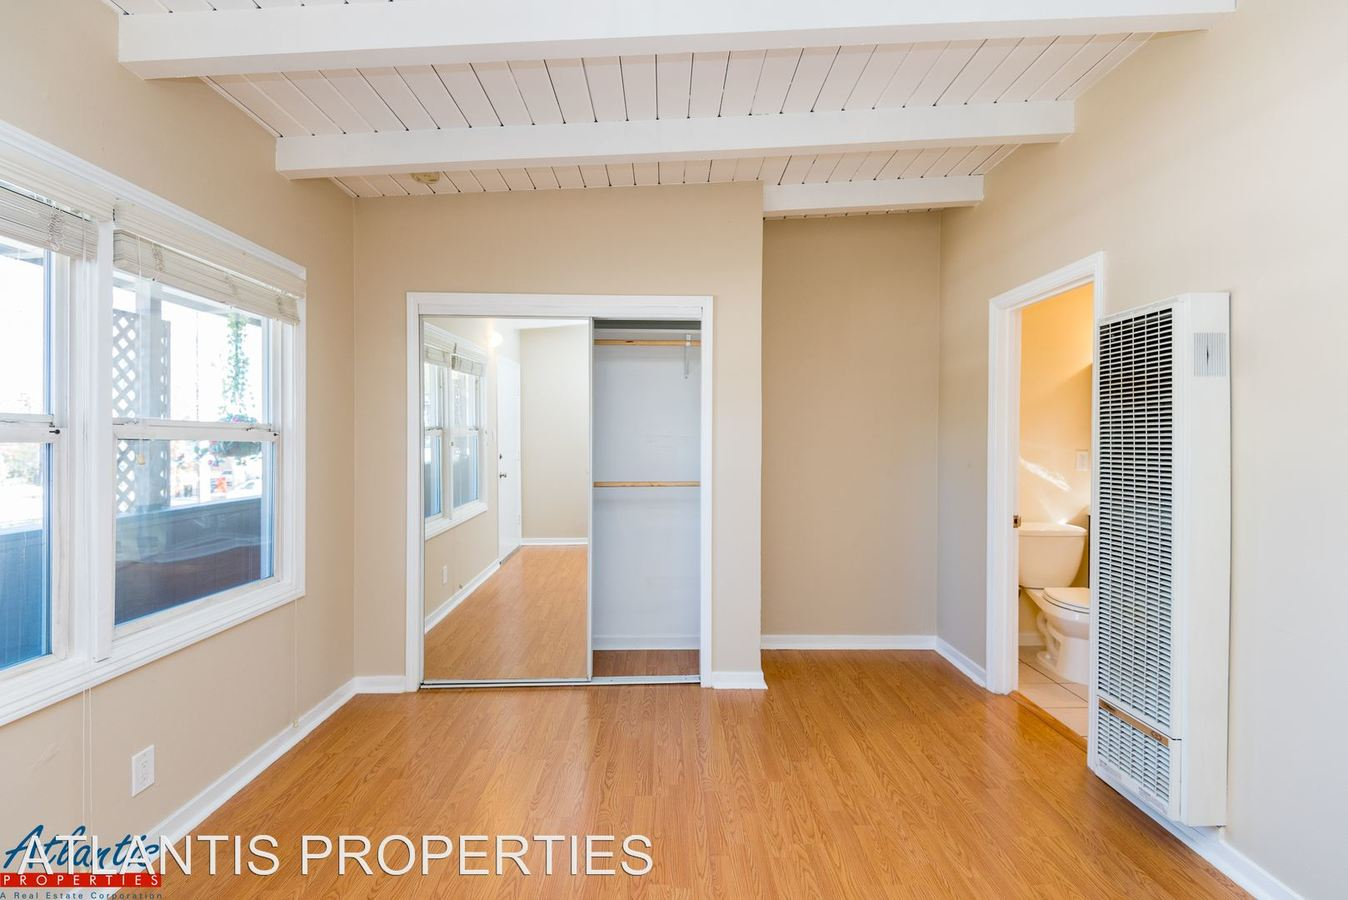 Studio 1 Bathroom Apartment for rent at 589 N. 3rd Street in San Jose, CA